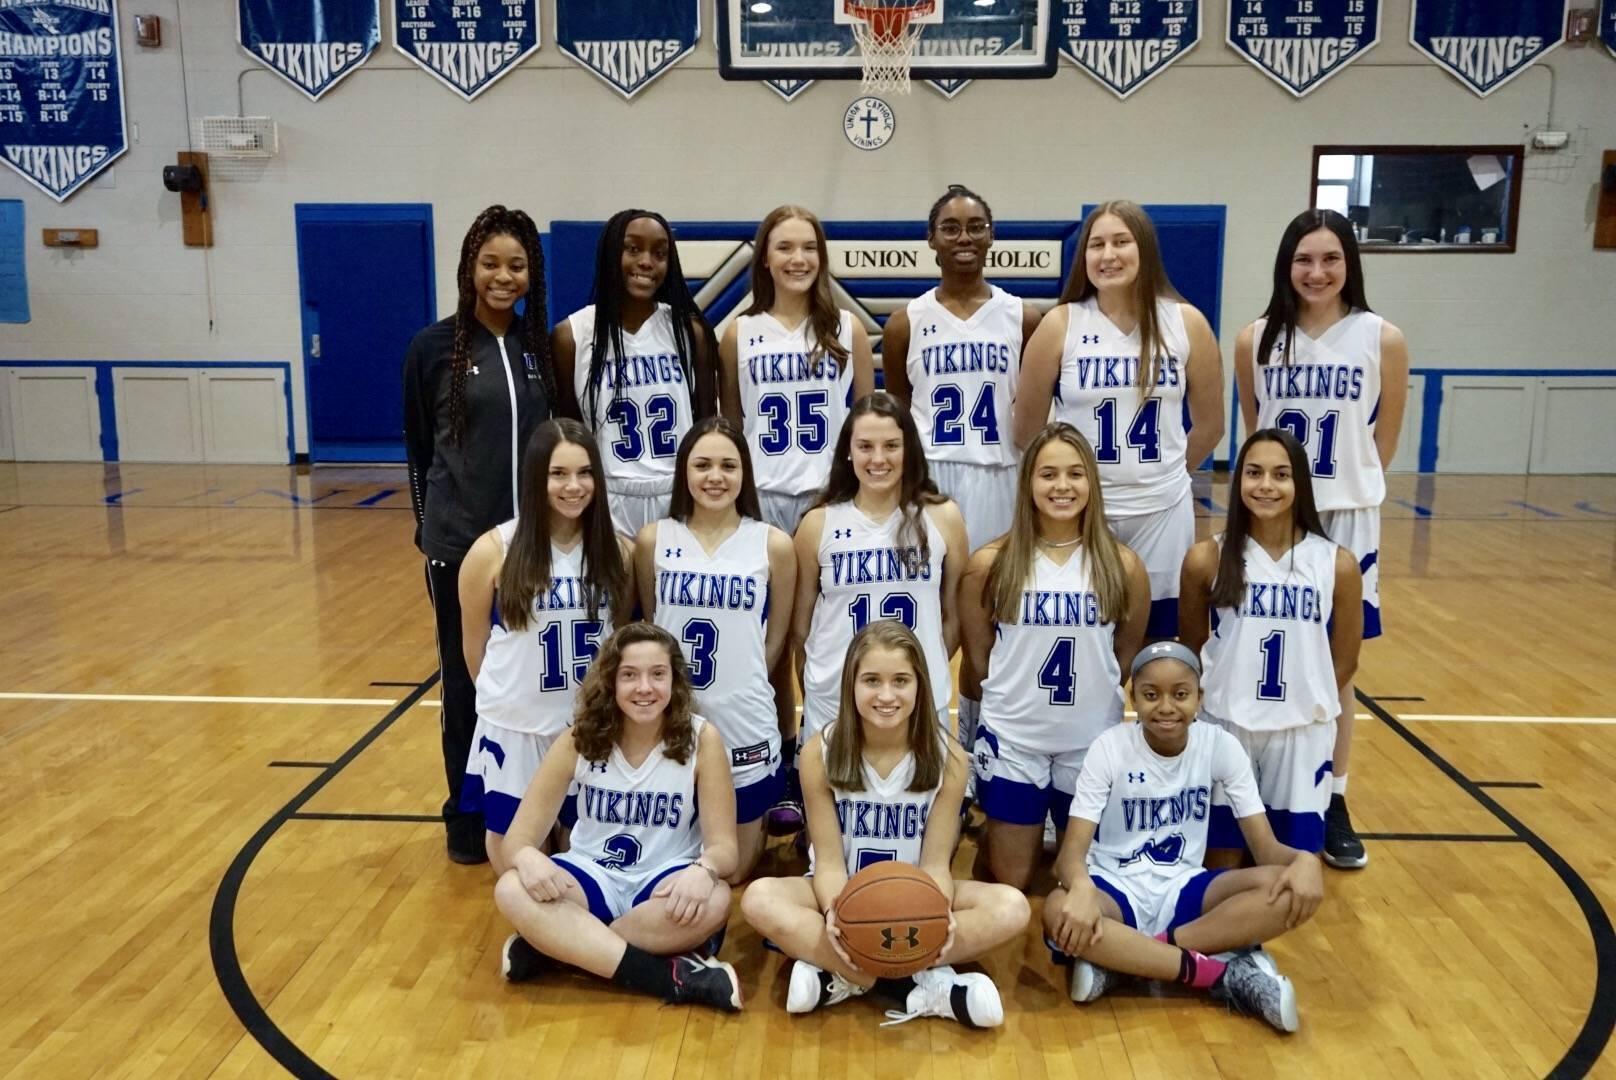 Girls basketball UC team photo 2019 correct one.jpg